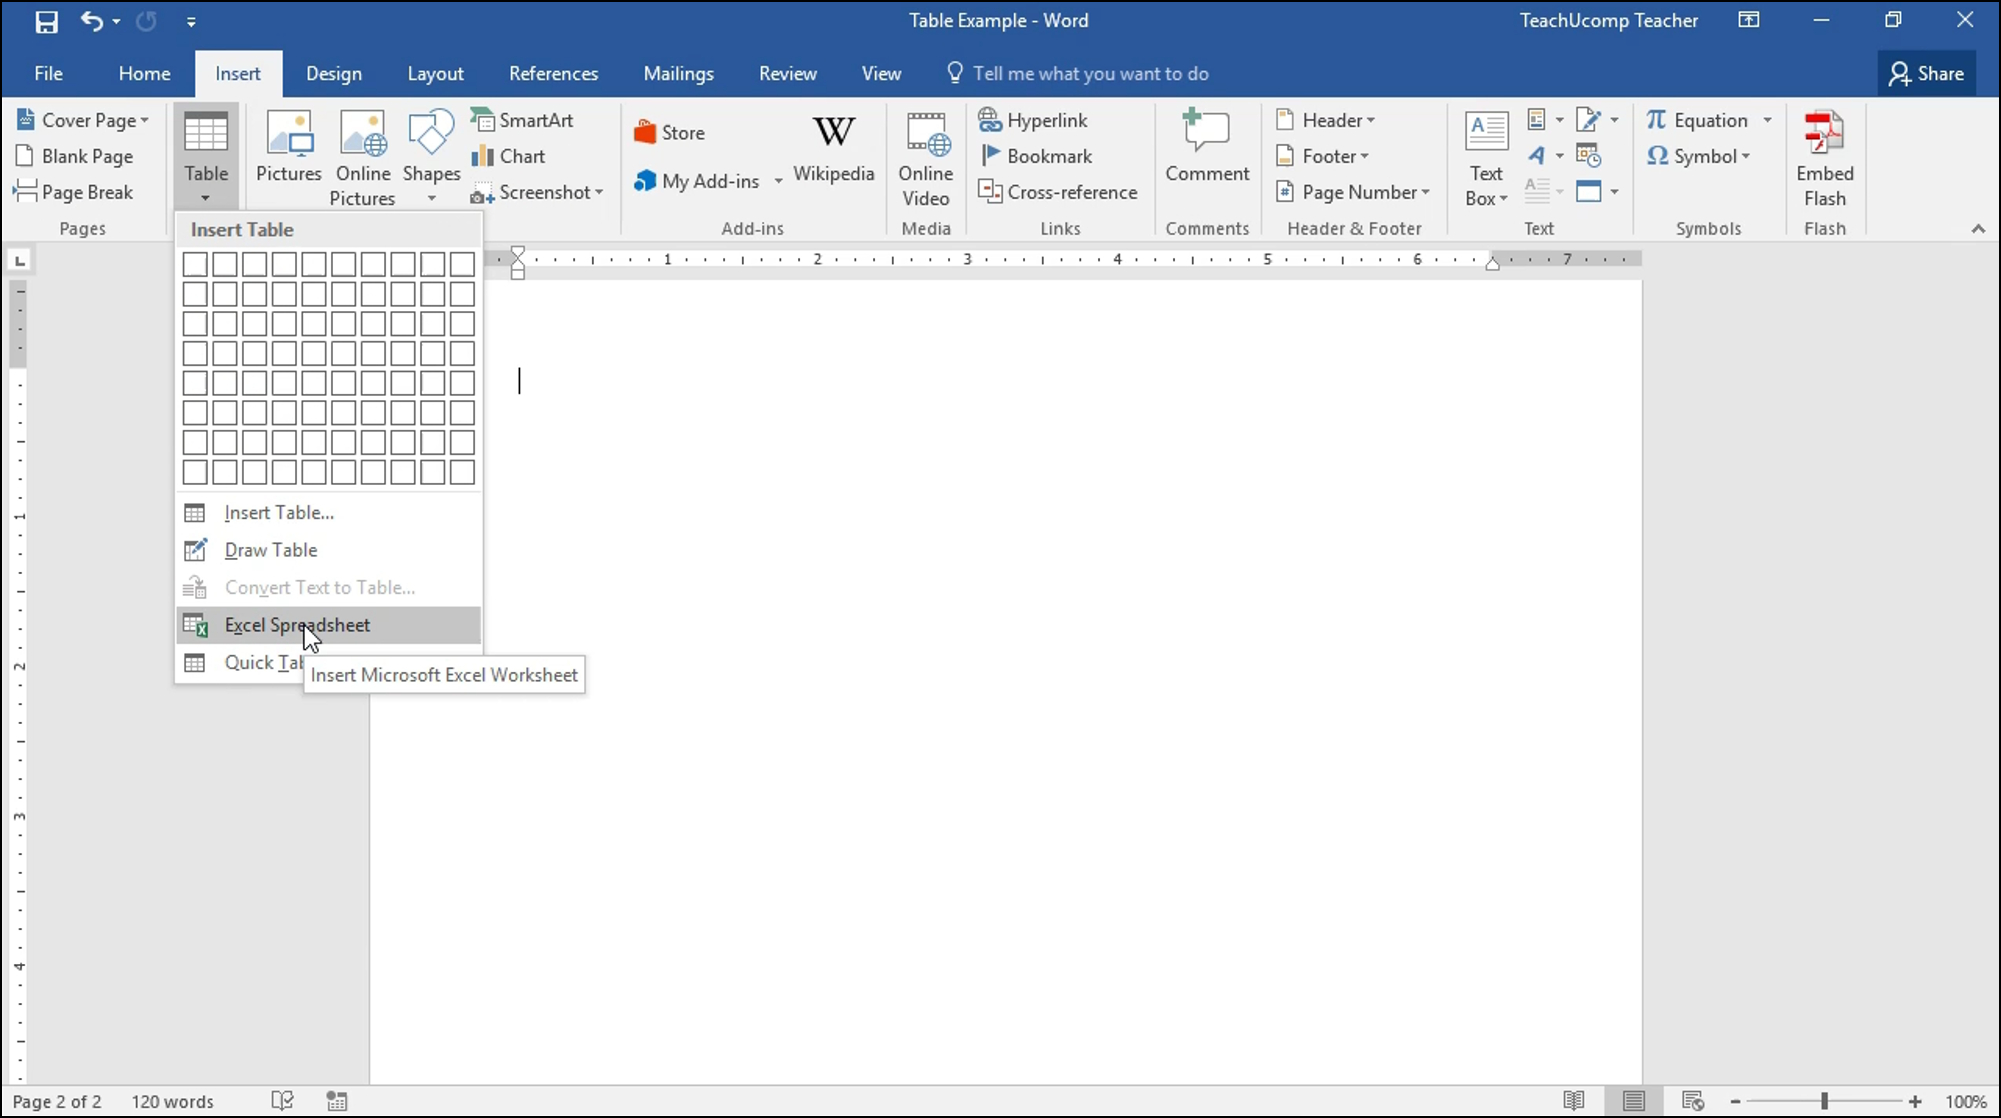 Personal Training Excel Spreadsheet Spreadsheet Downloa